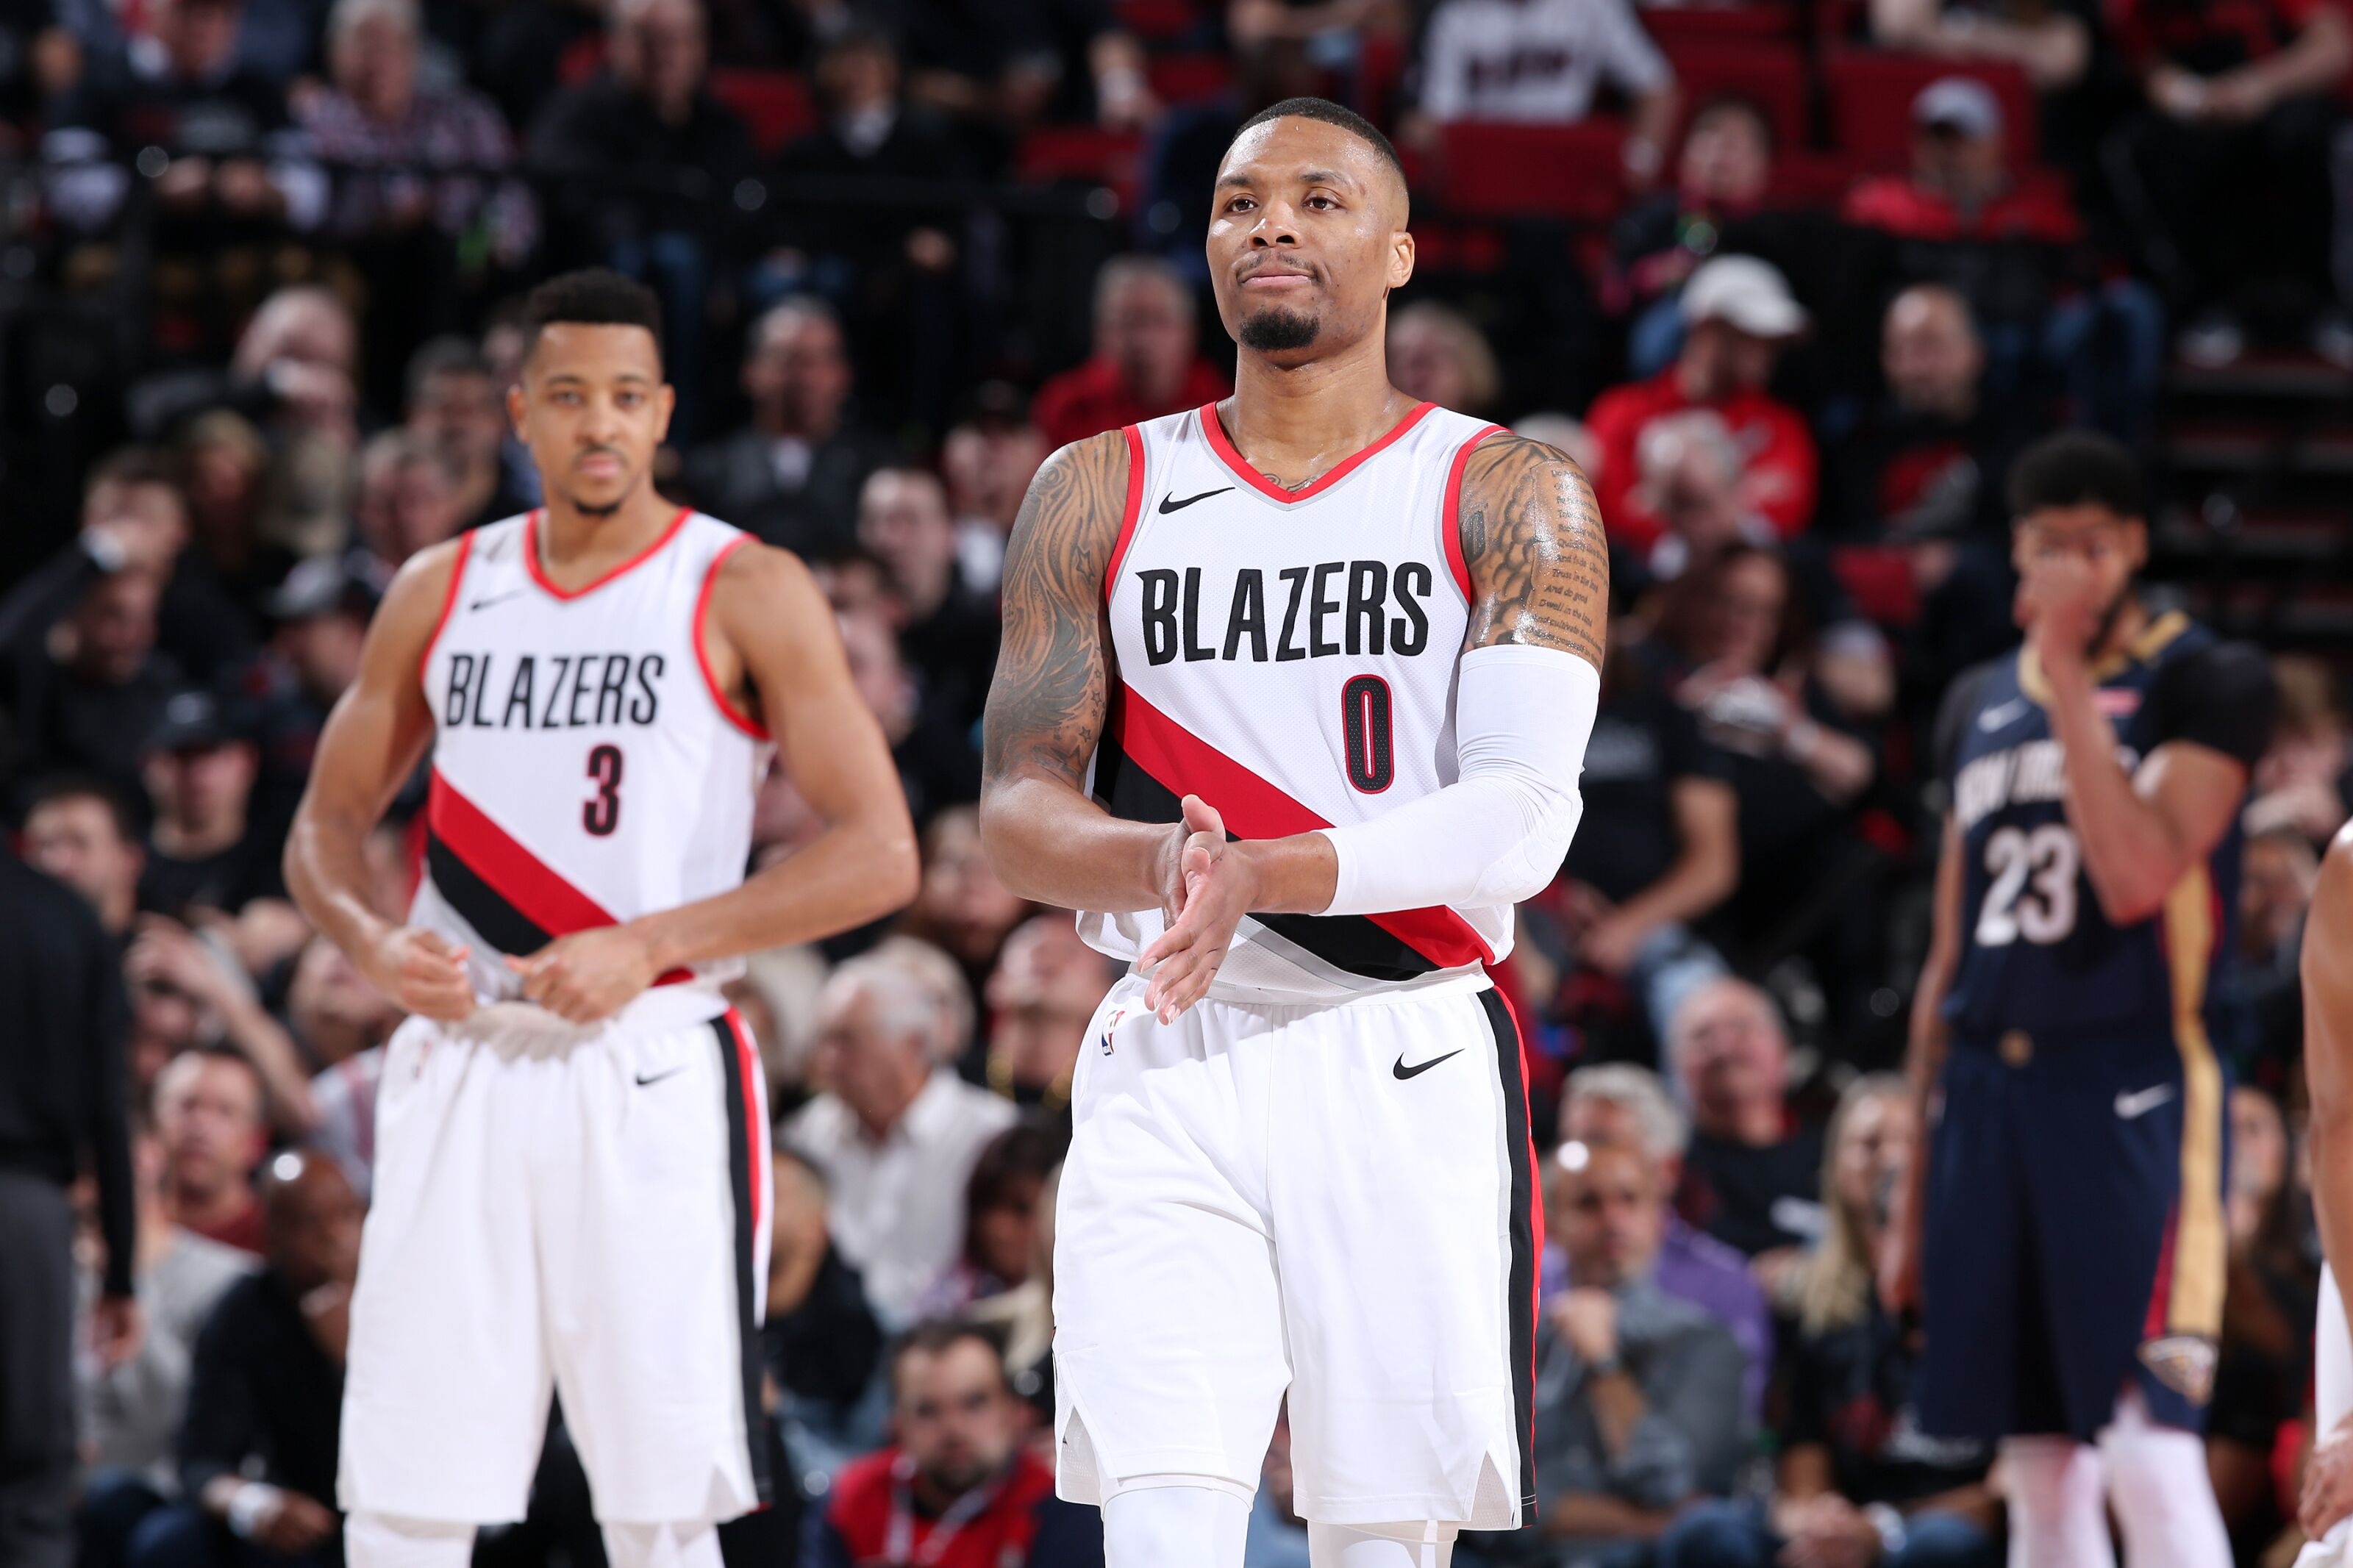 Portland Trail Blazers 3 takeaways from Game 1 vs. Pelicans